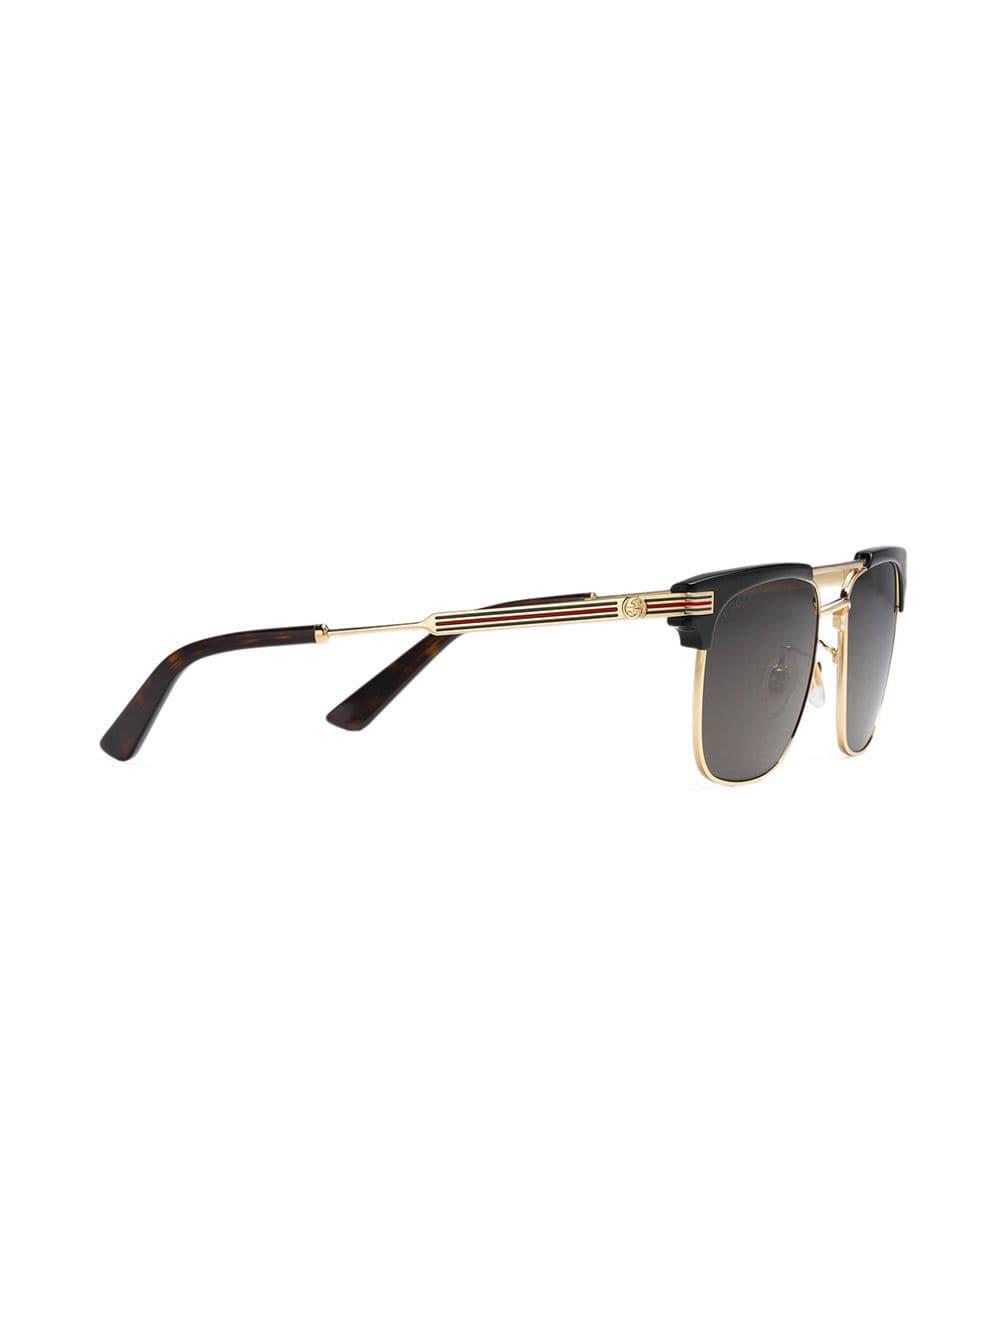 831d83df5a Gucci - Metallic Square-frame Metal Sunglasses for Men - Lyst. View  fullscreen